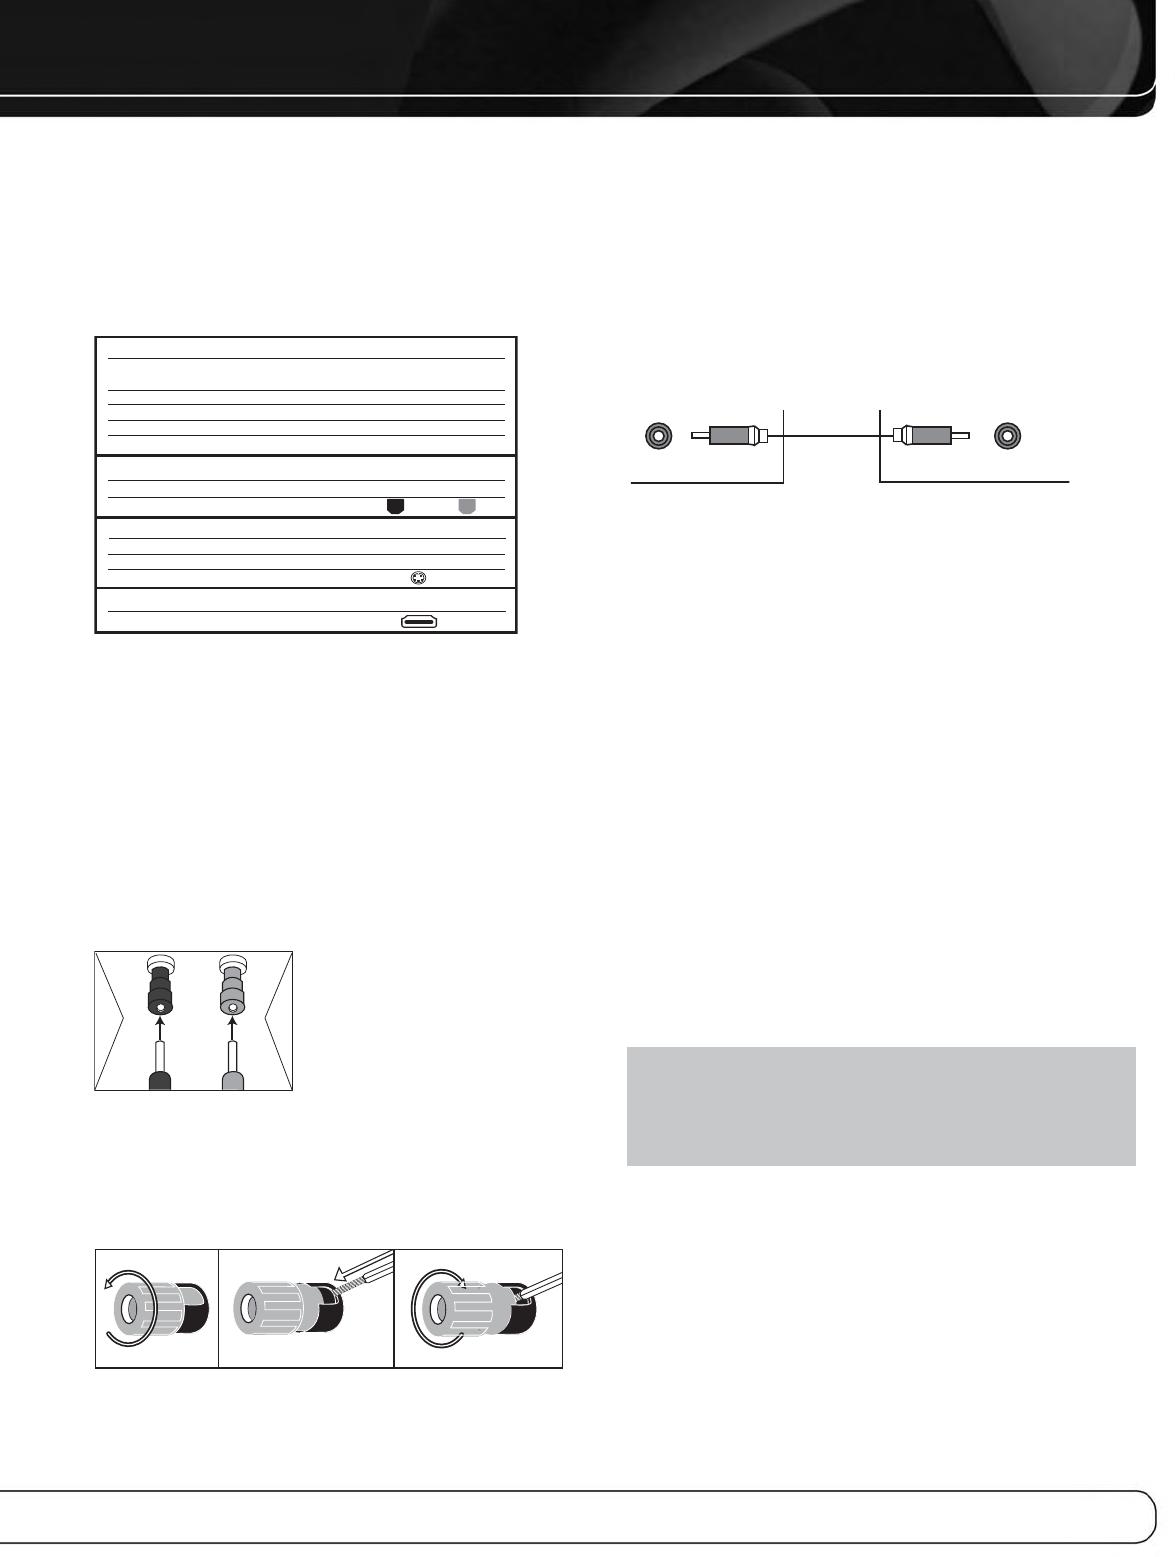 Harman-Kardon AVR 1600 Speaker Connections, Subwoofer ... on